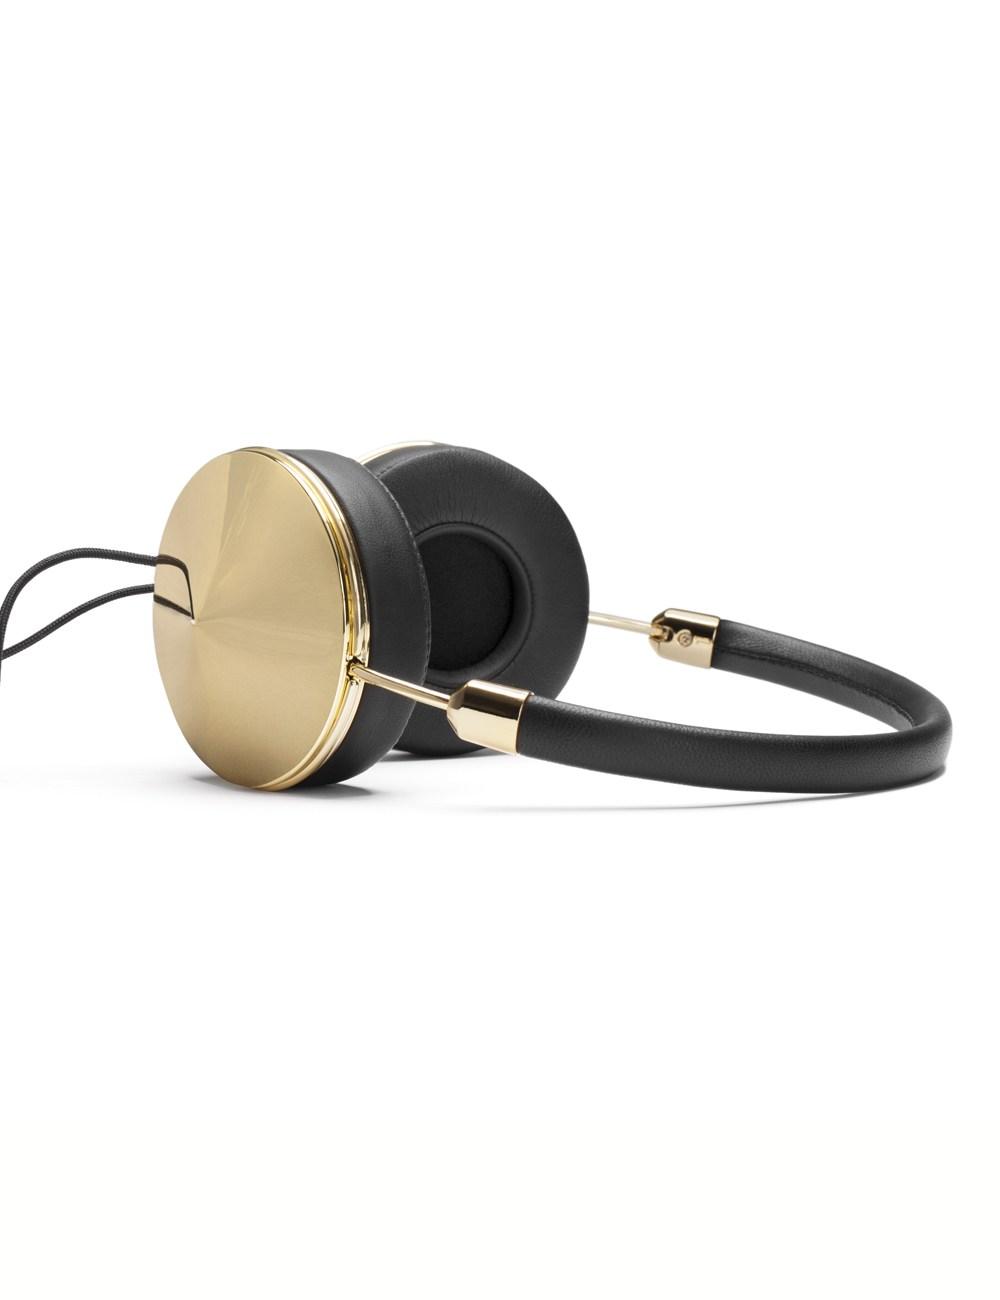 Gold black taylor headphones